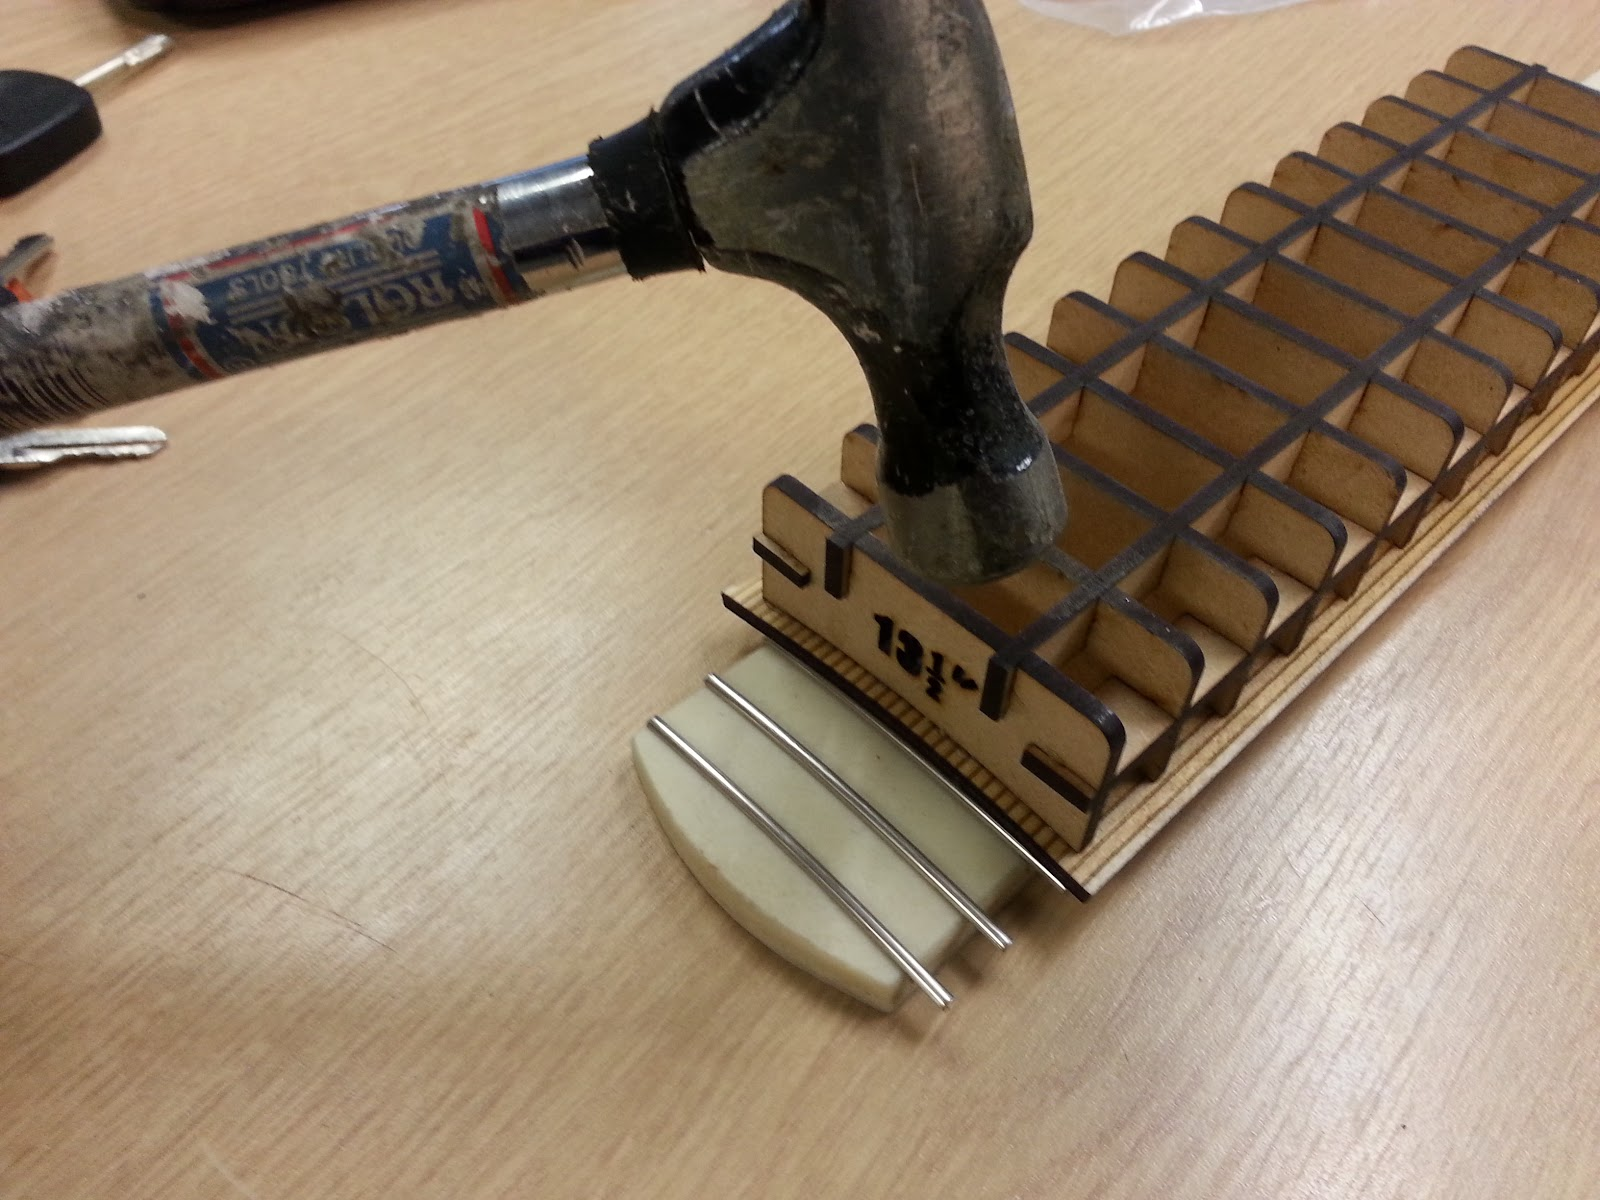 nerd club resin casting a guitar fingerboard. Black Bedroom Furniture Sets. Home Design Ideas